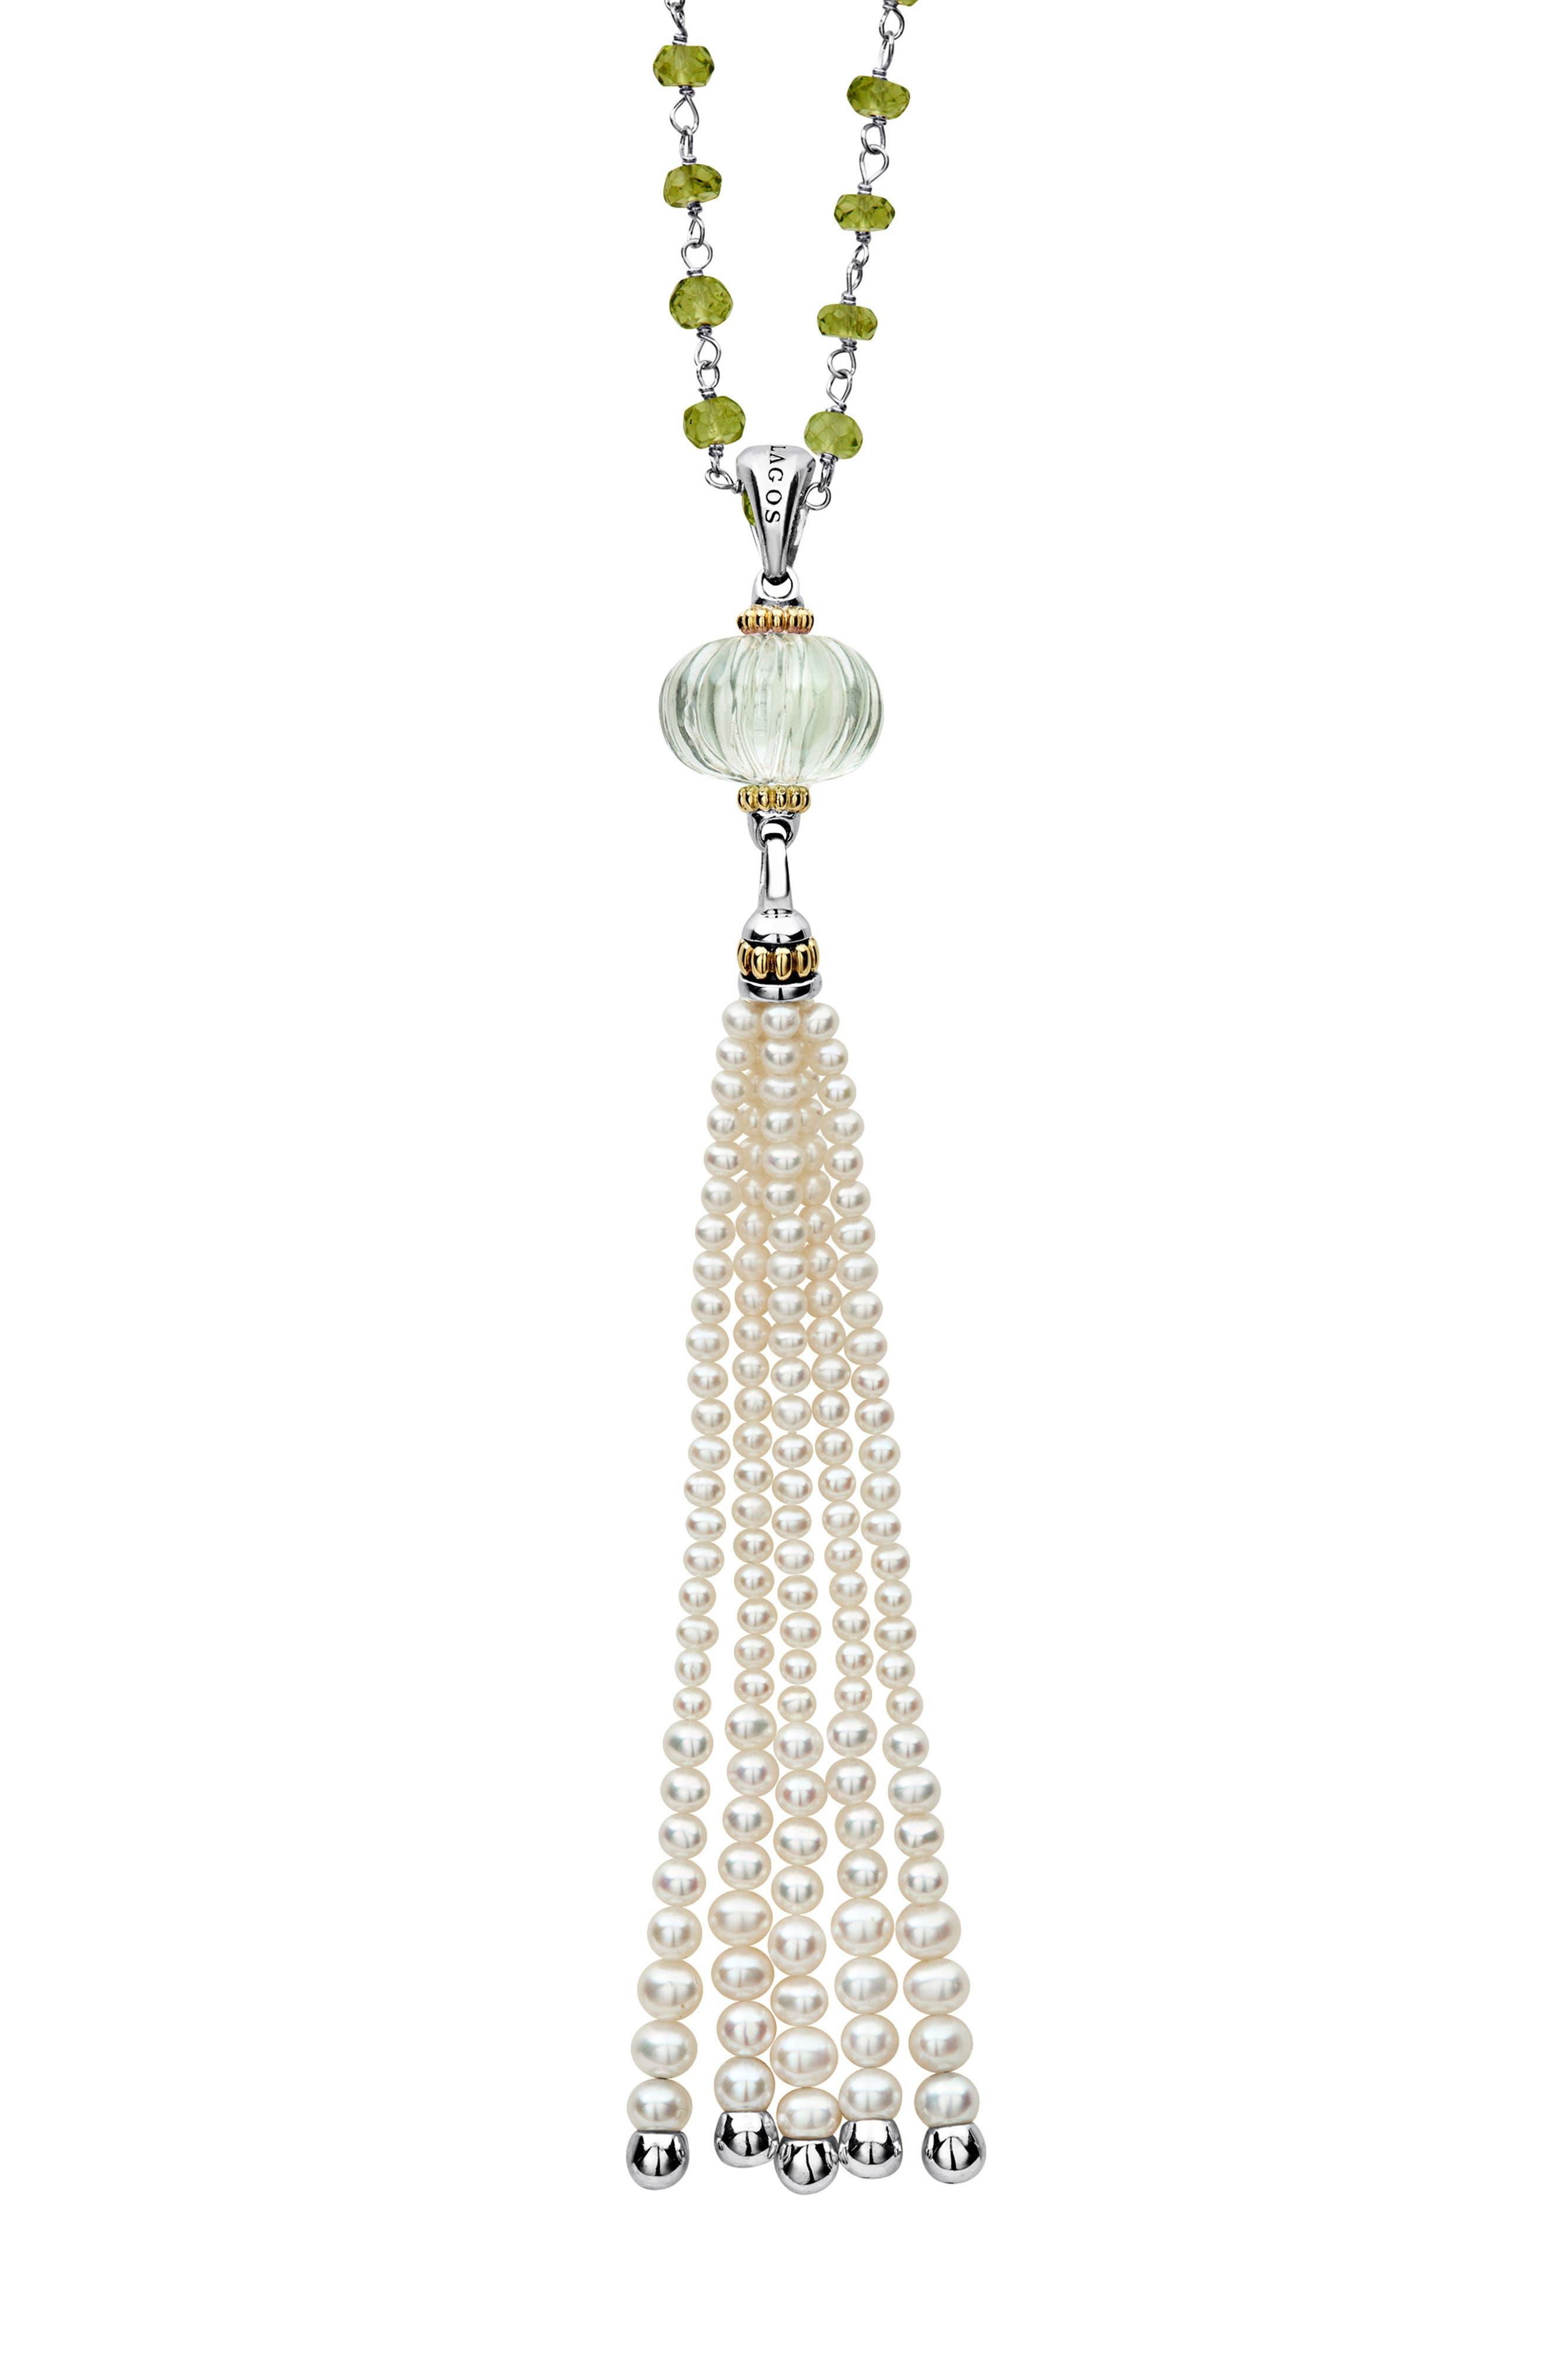 Caviar Forever Gemstone Tassel Pendant Necklace,                         Main,                         color, SILVER/ GREEN AMETHYST